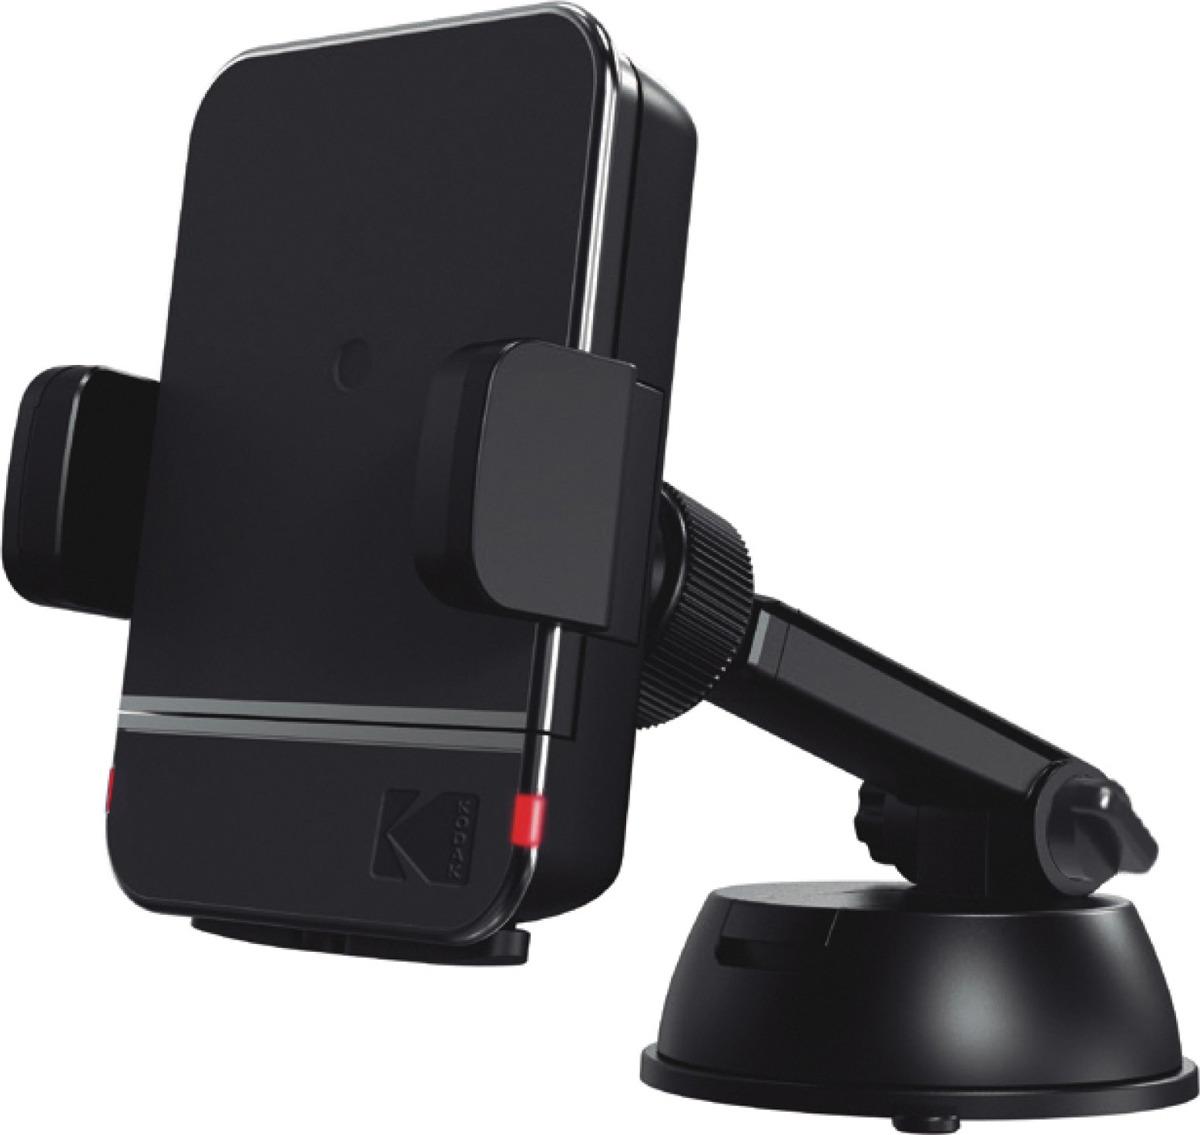 Автомобильное зарядное устройство Kodak, UC103, черный зарядное устройство для фотокамеры generic 10pcs lot klic7003 klic 7003 k7003 kodak easyshare m380 m381 m420 md81 v1003 v803 z950